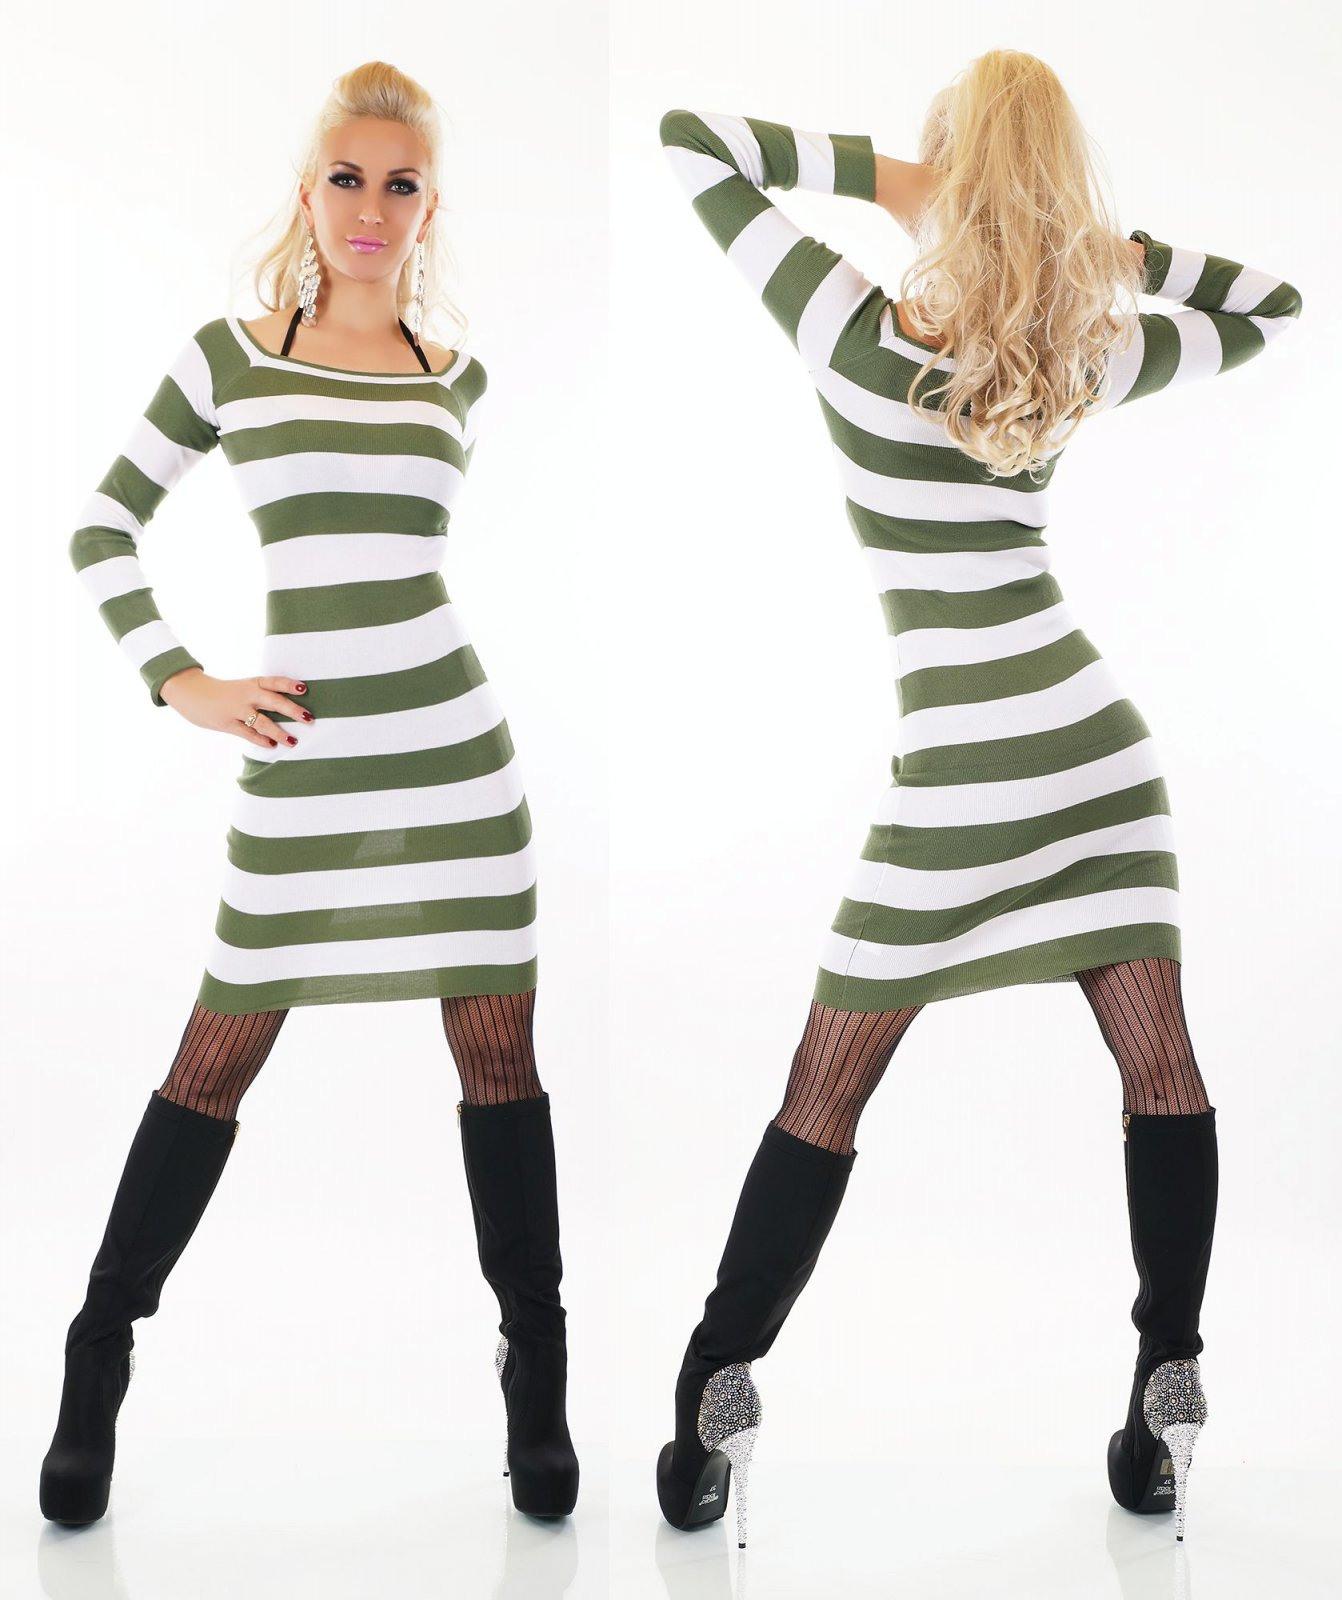 Damen Strick Kleid Minikleid Long Pullover Pulli Longshirt